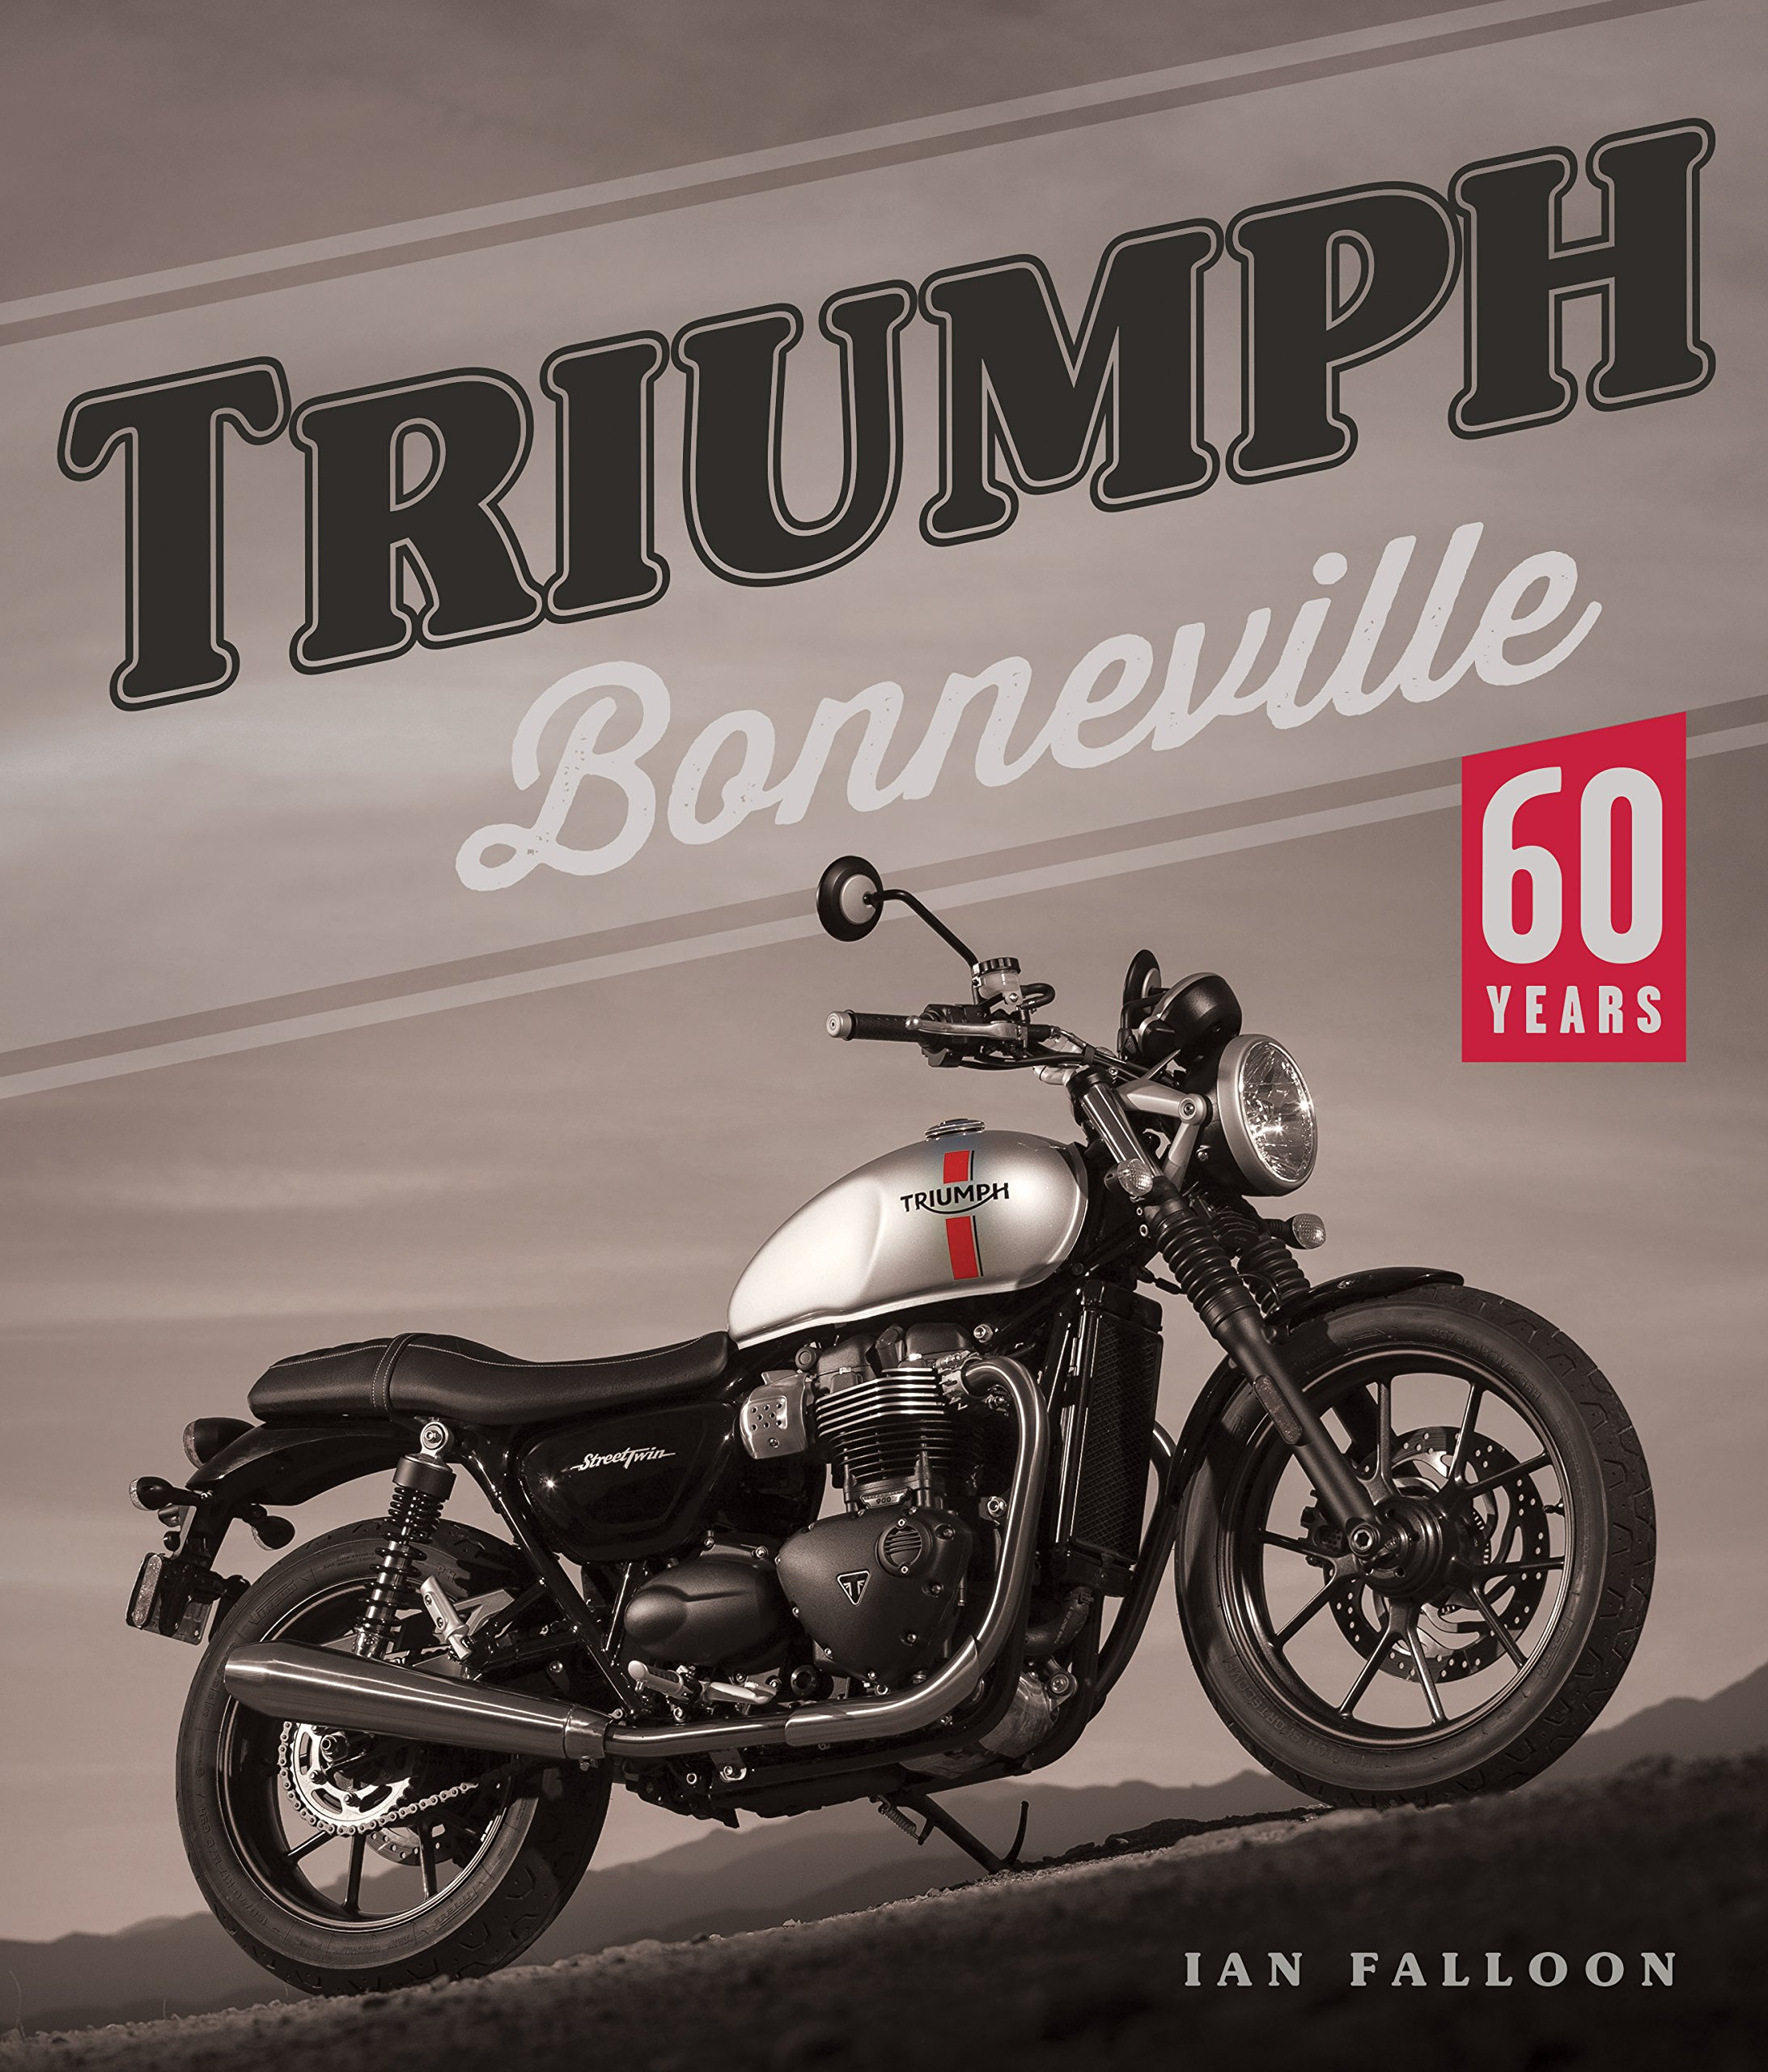 Triumph Bonneville 60 Years Ian Falloon 9780760360910 Amazoncom